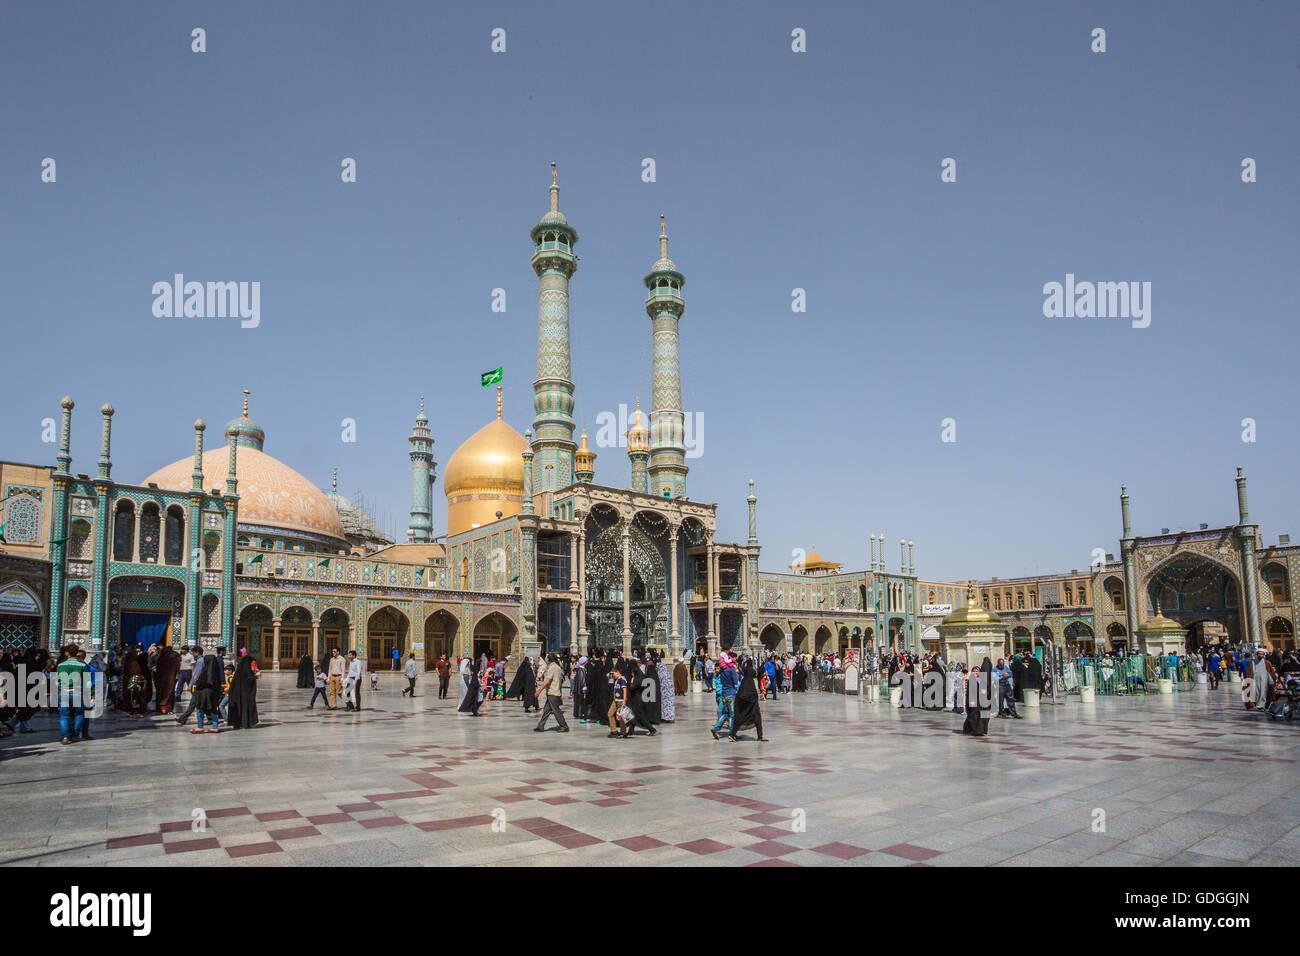 Iran,Qom City,Hazrat-e Masumeh (Holy Shrine) Stock Photo